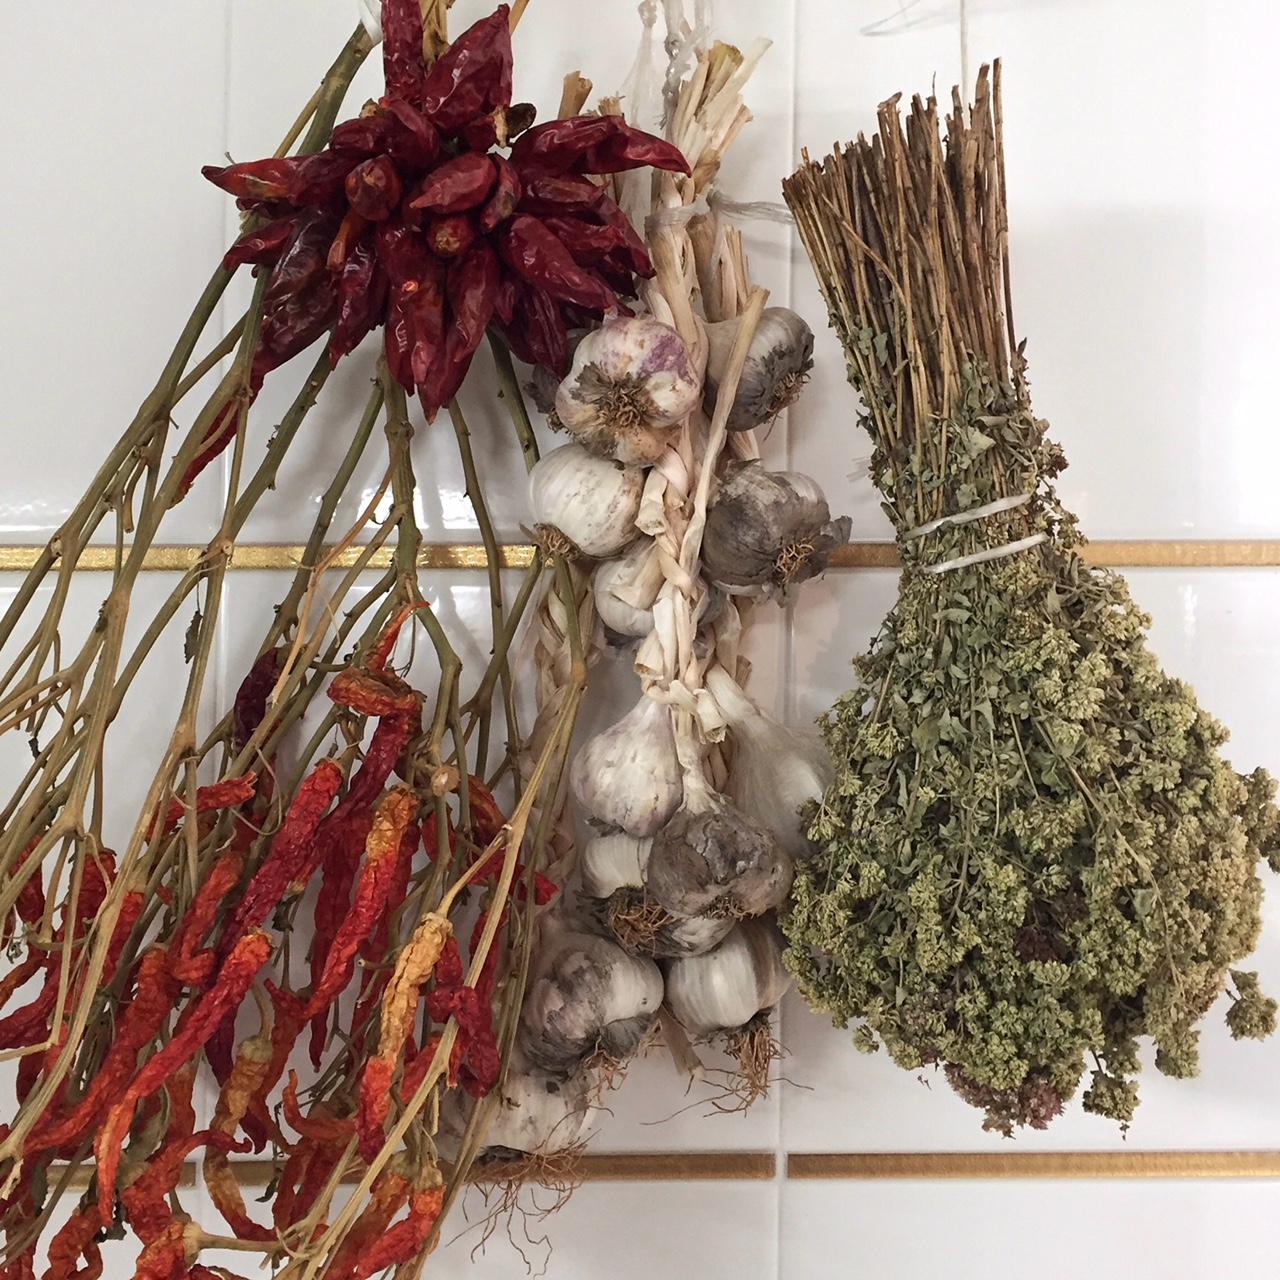 Gedroogde oregano in de Italiaanse keuken